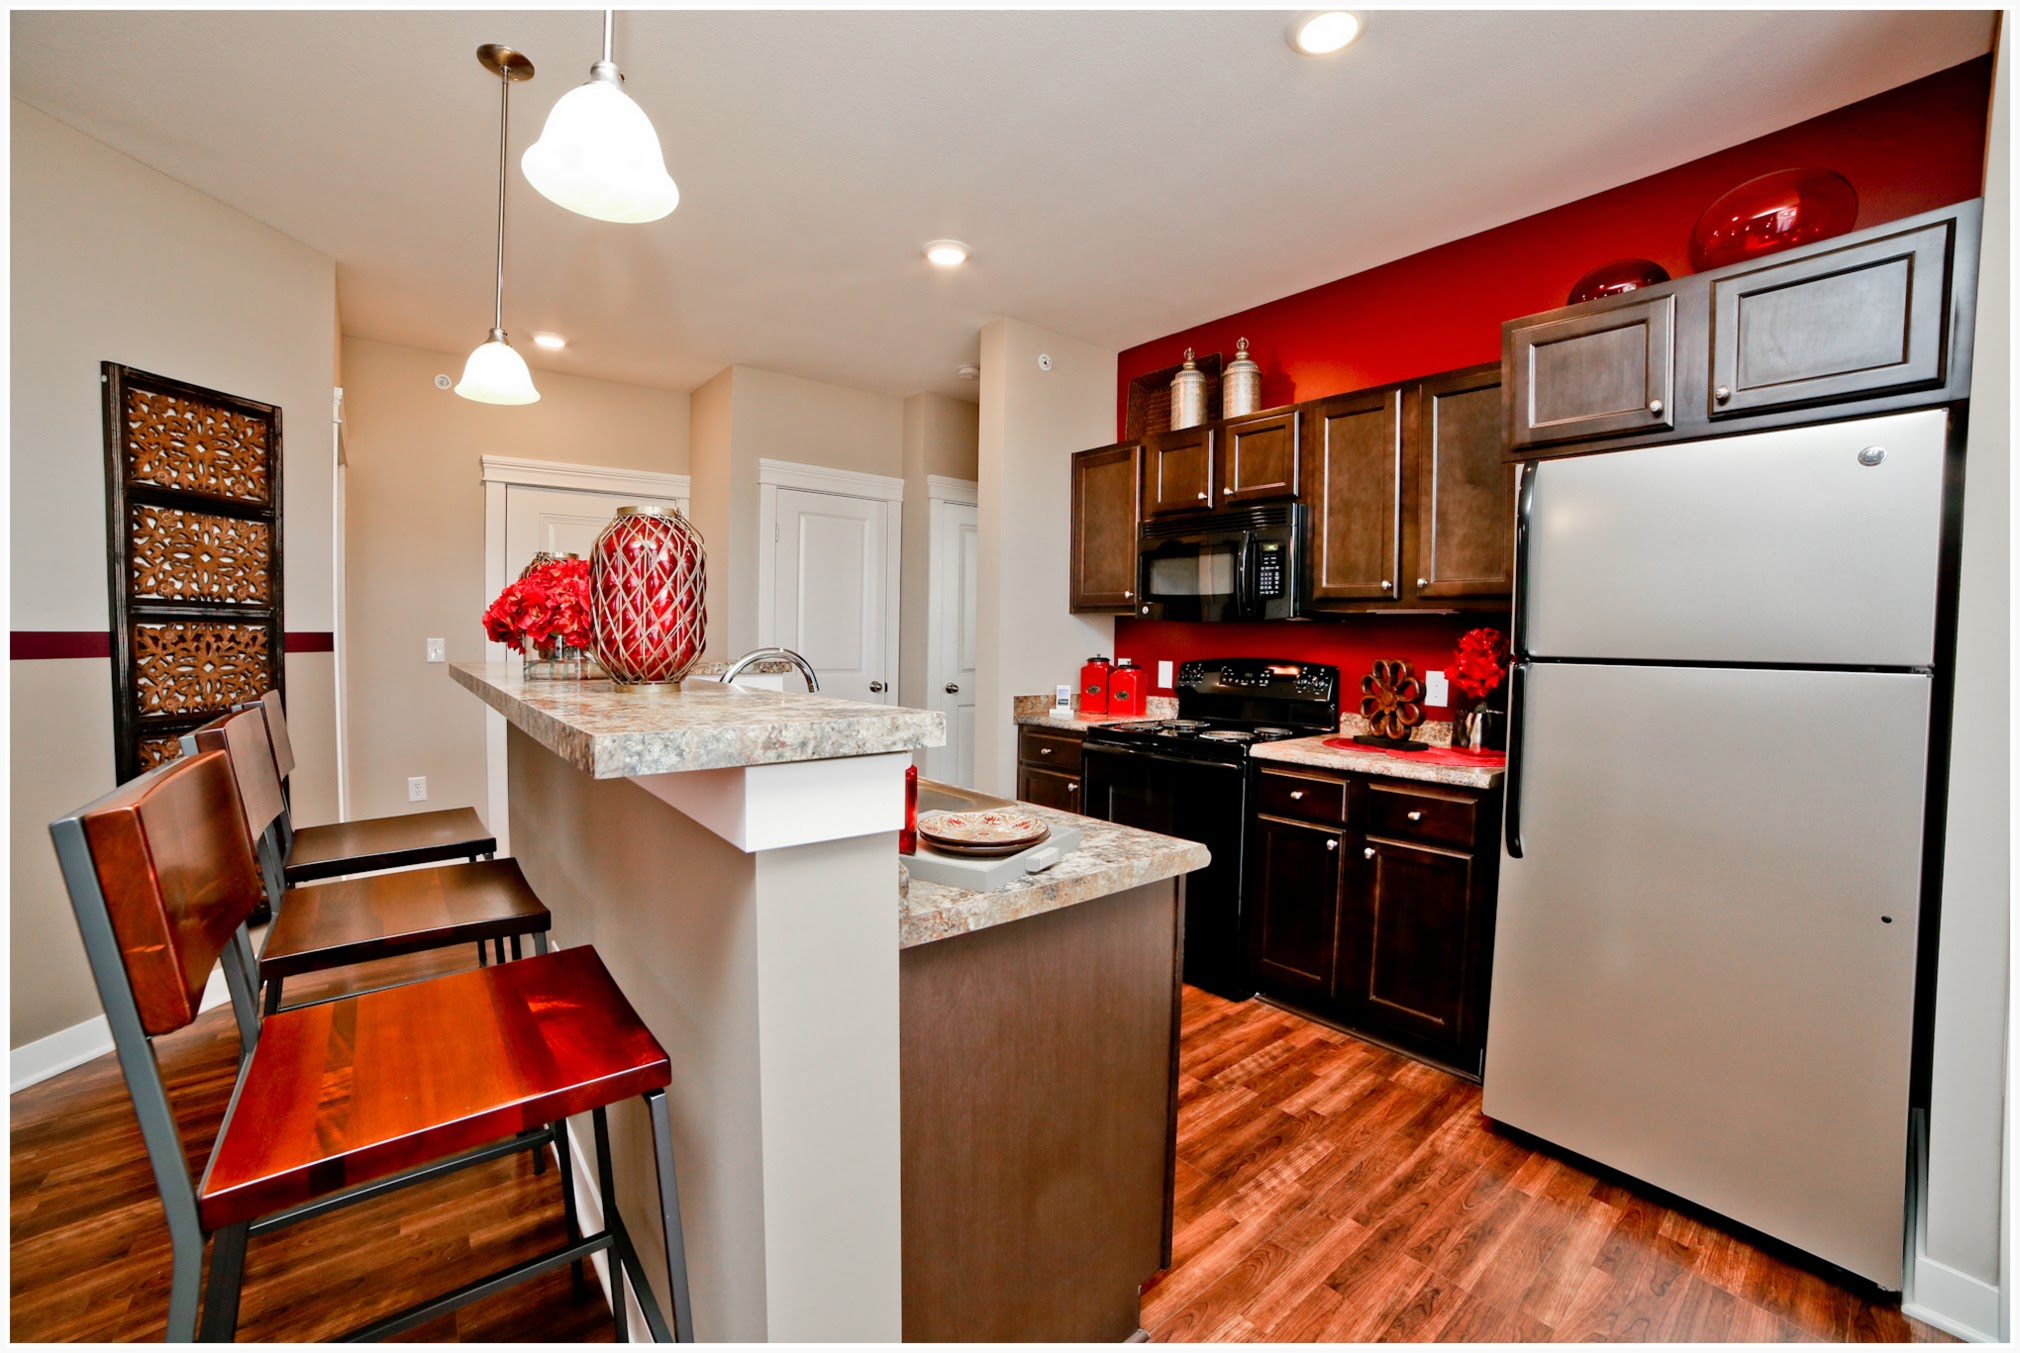 Hamilton - model kitchen (apartment).jpg